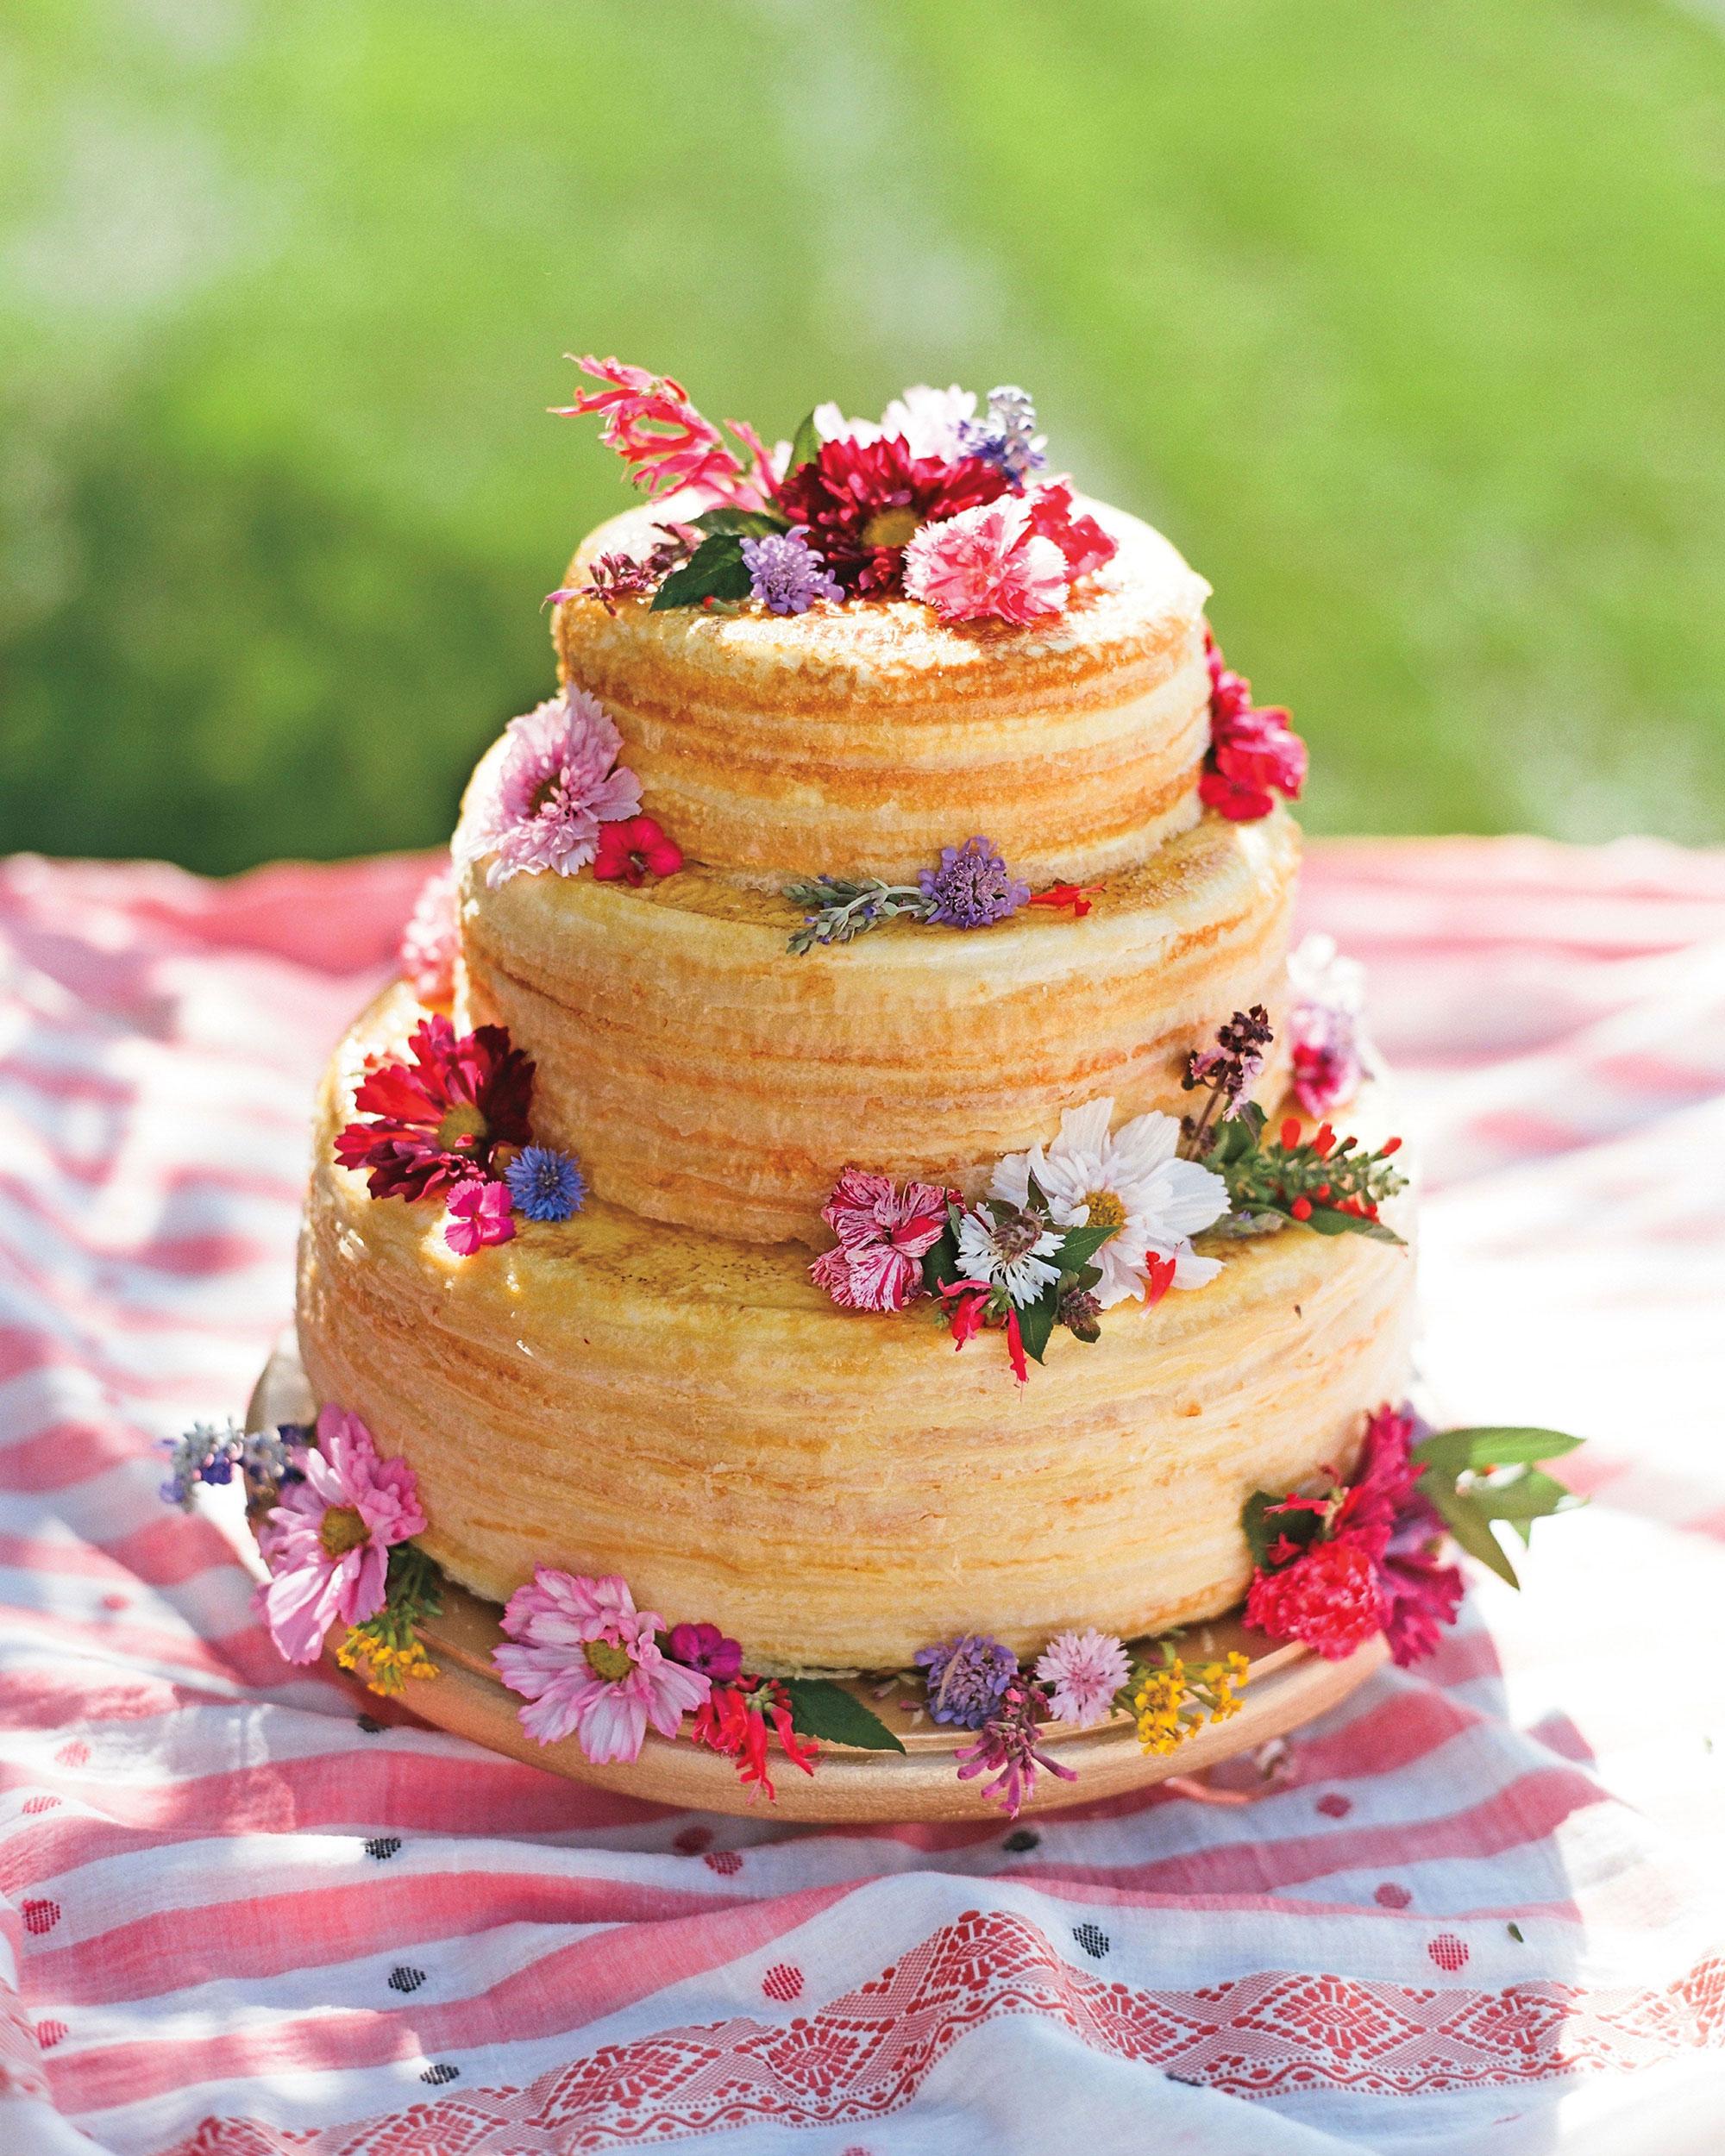 mfiona-peter-wedding-vermont-naked-floral-cake-9645.15.2015.47-d112512.jpg